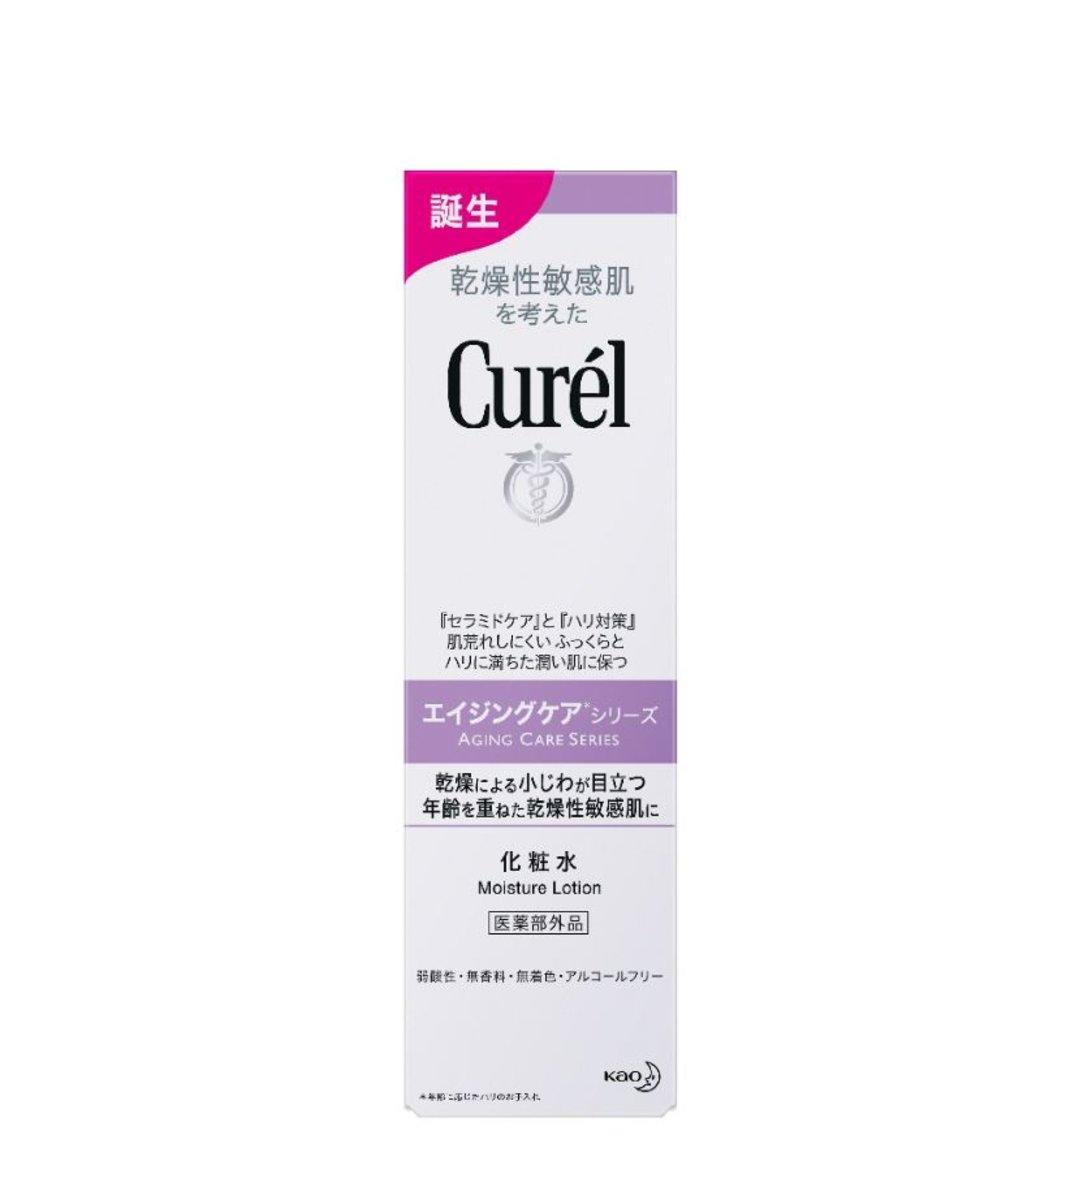 Curél Aging Care Moisture Lotion (140 ml)